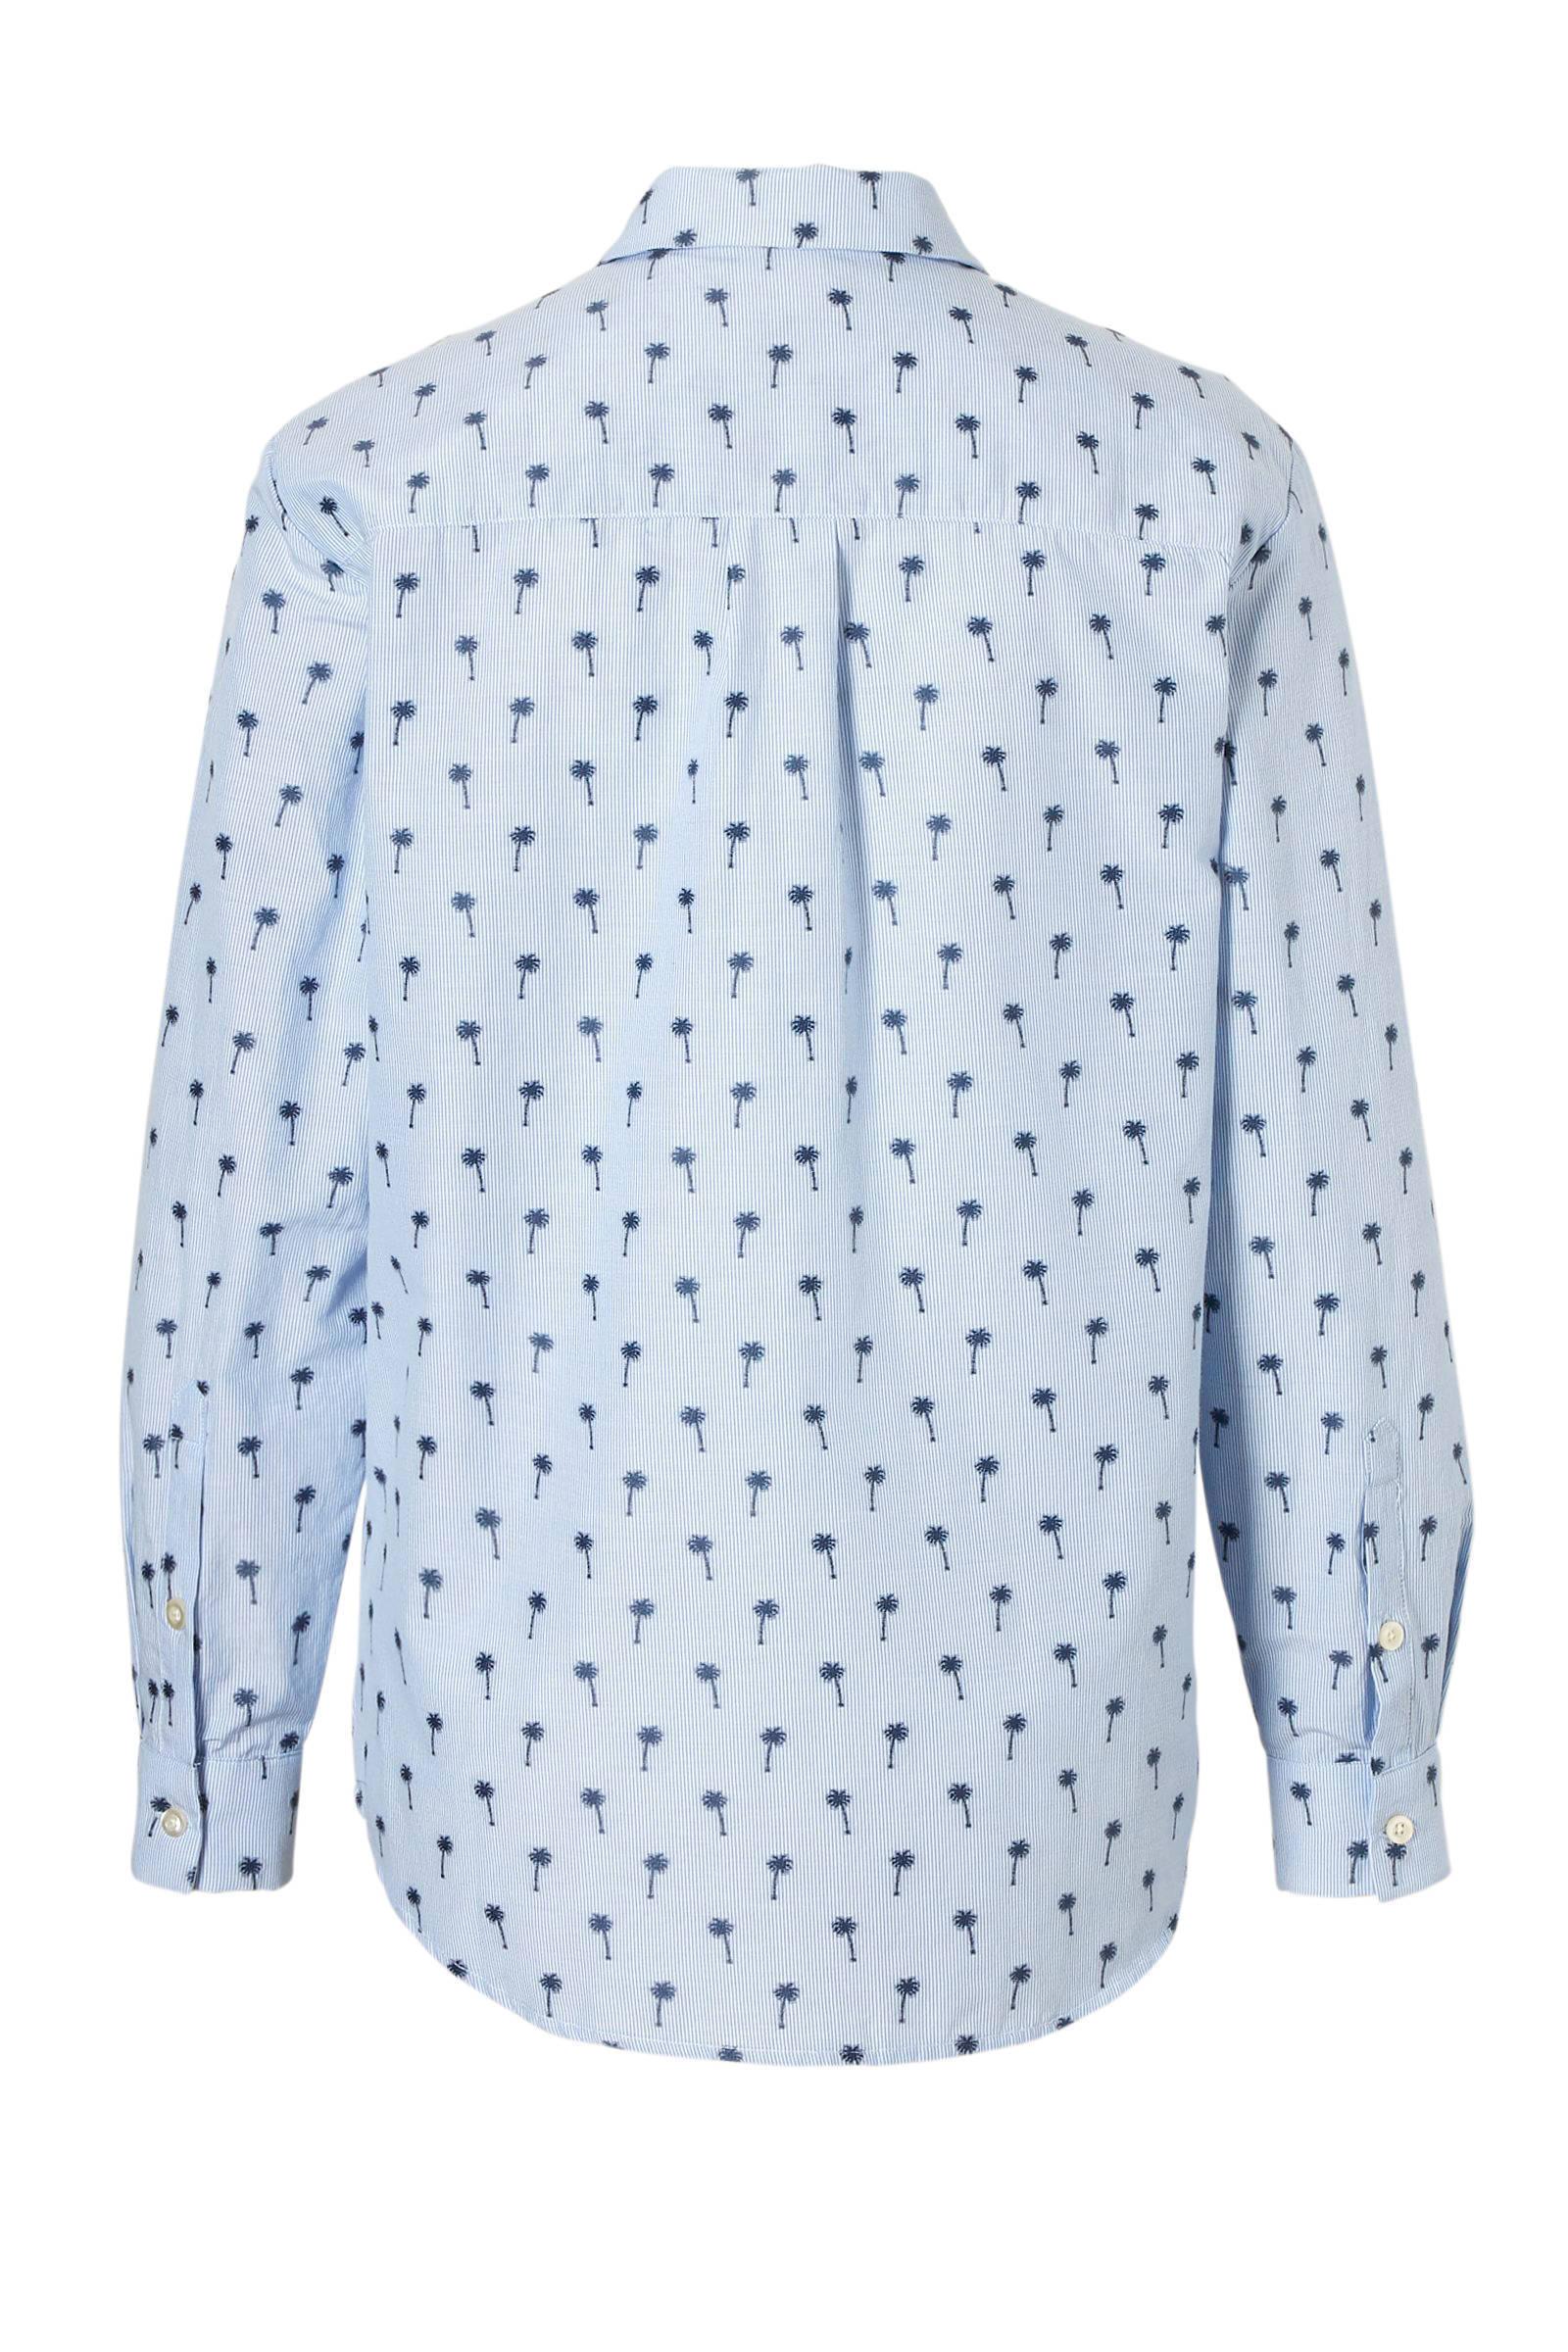 met Junkie Catwalk blouse blauw palmbomen wEYfq